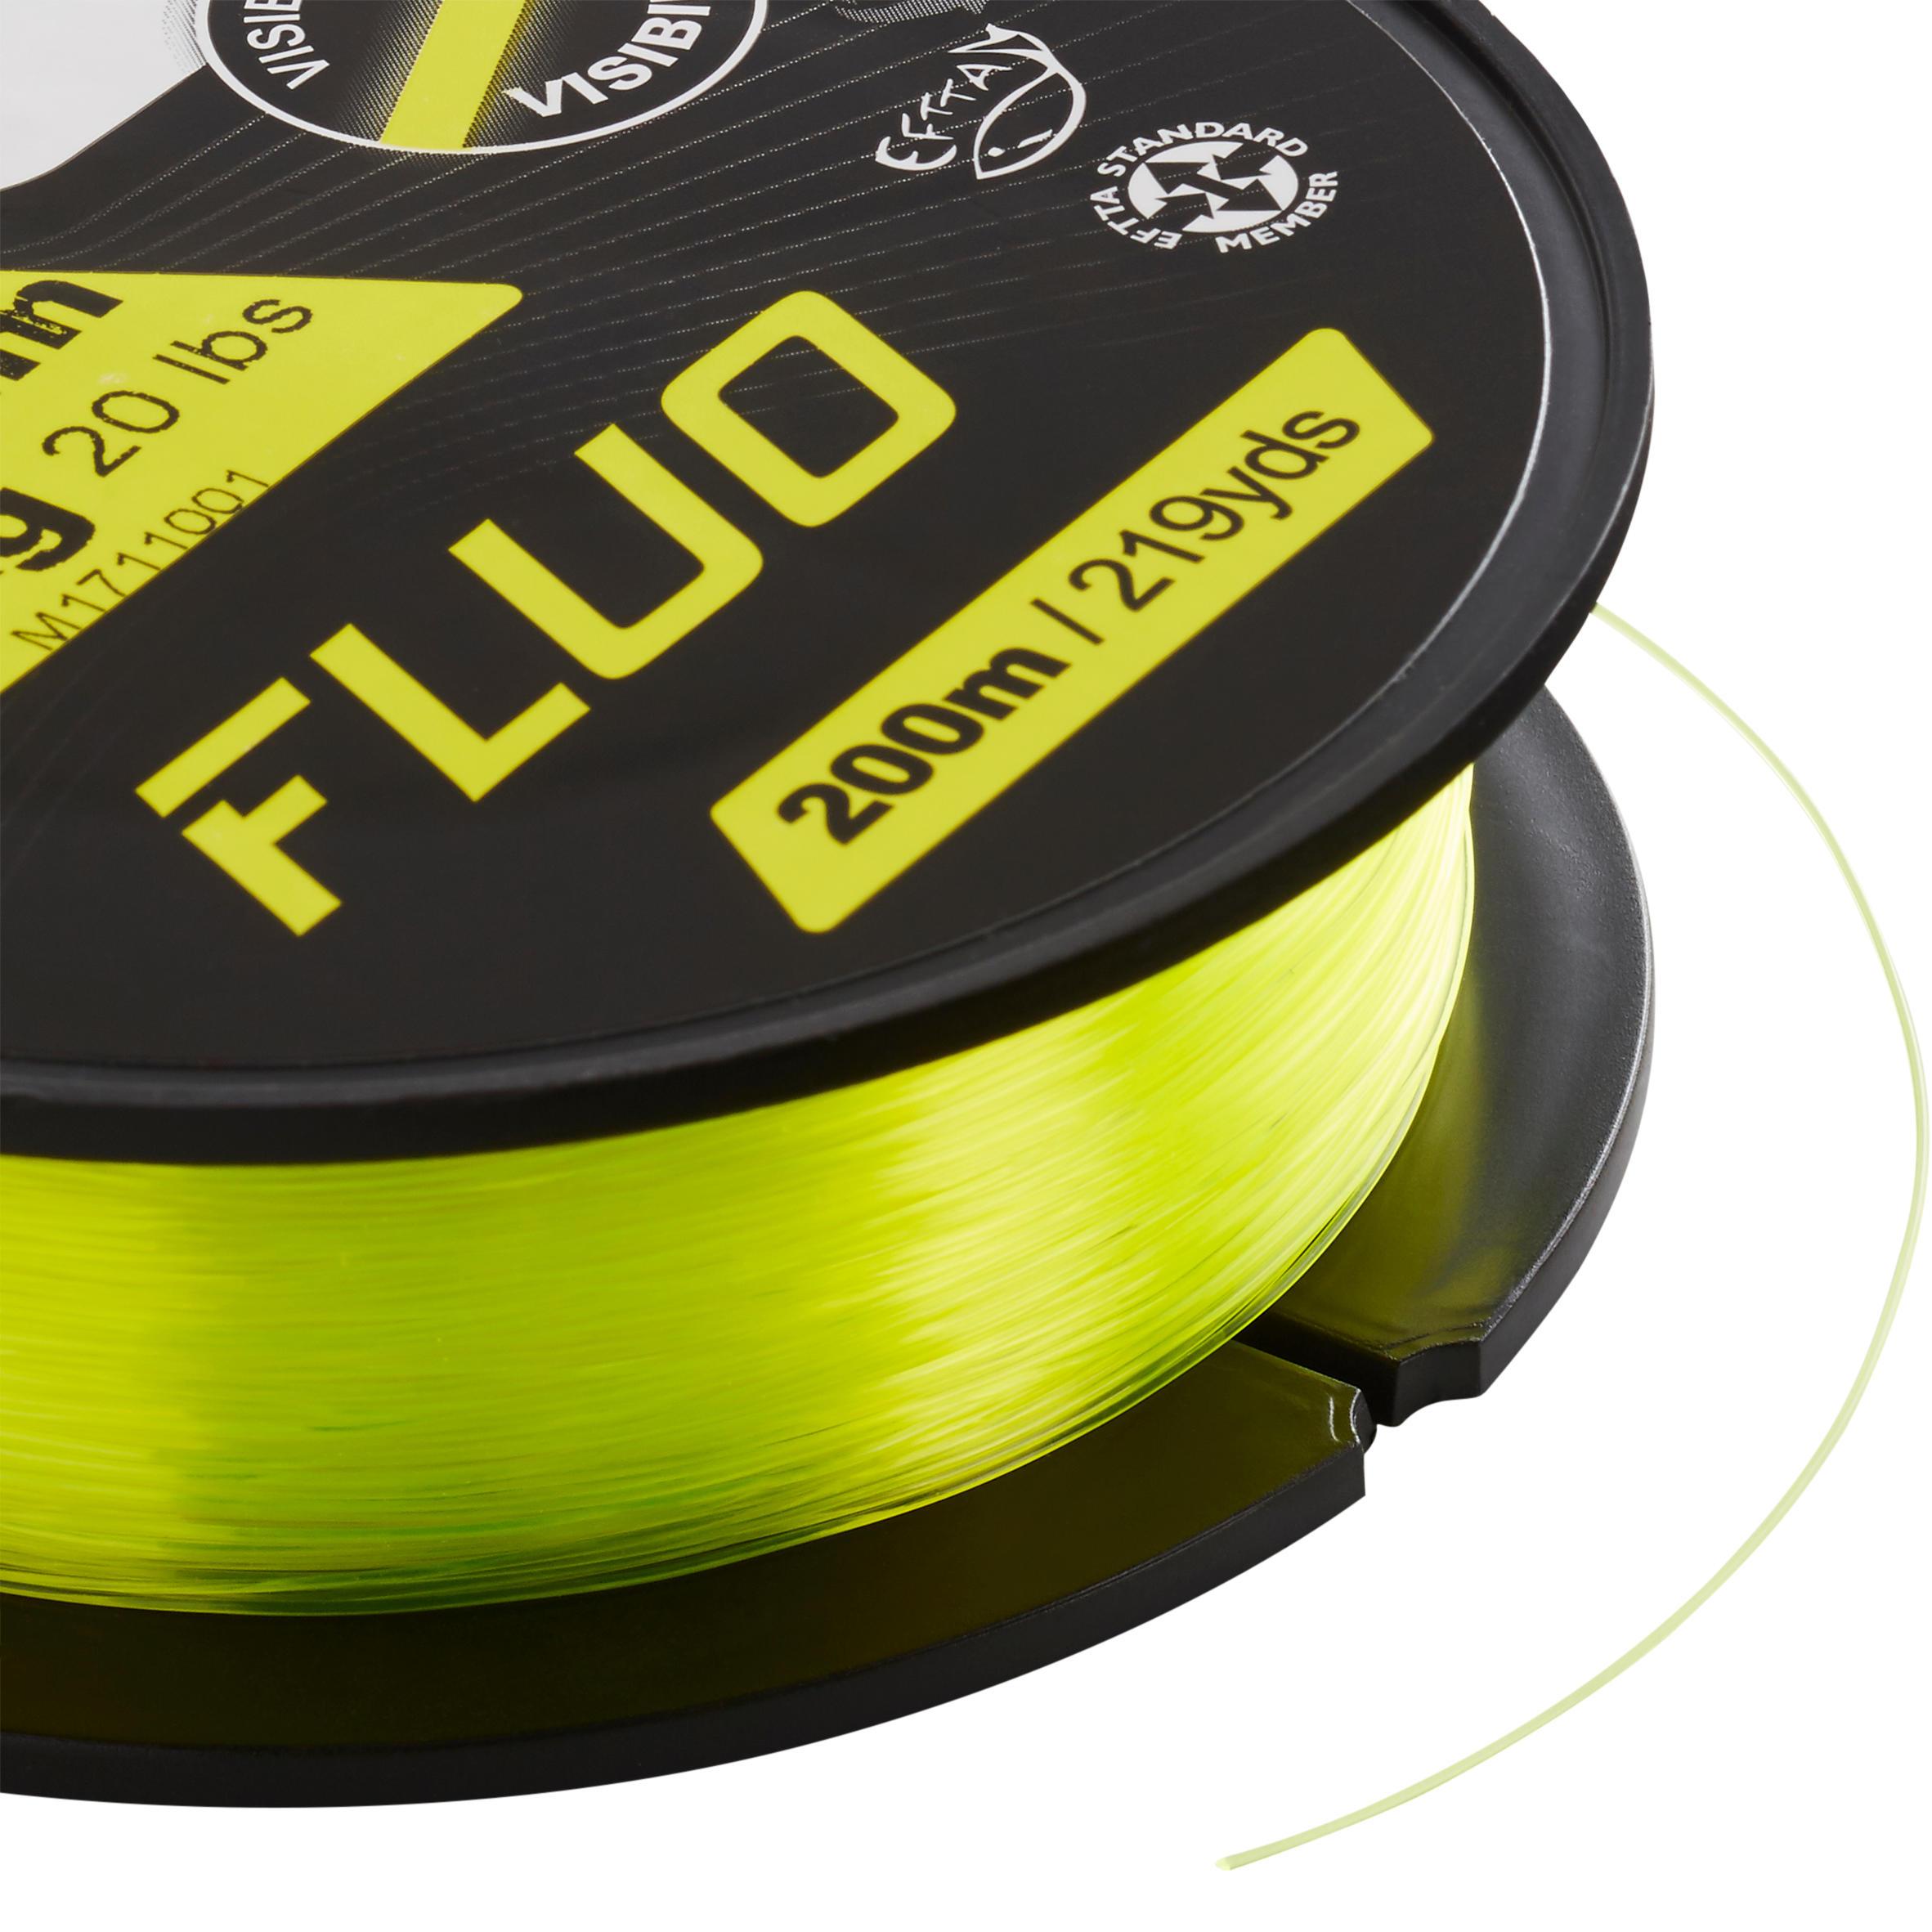 200 M FL Line Versatile Fishing Line - Neon